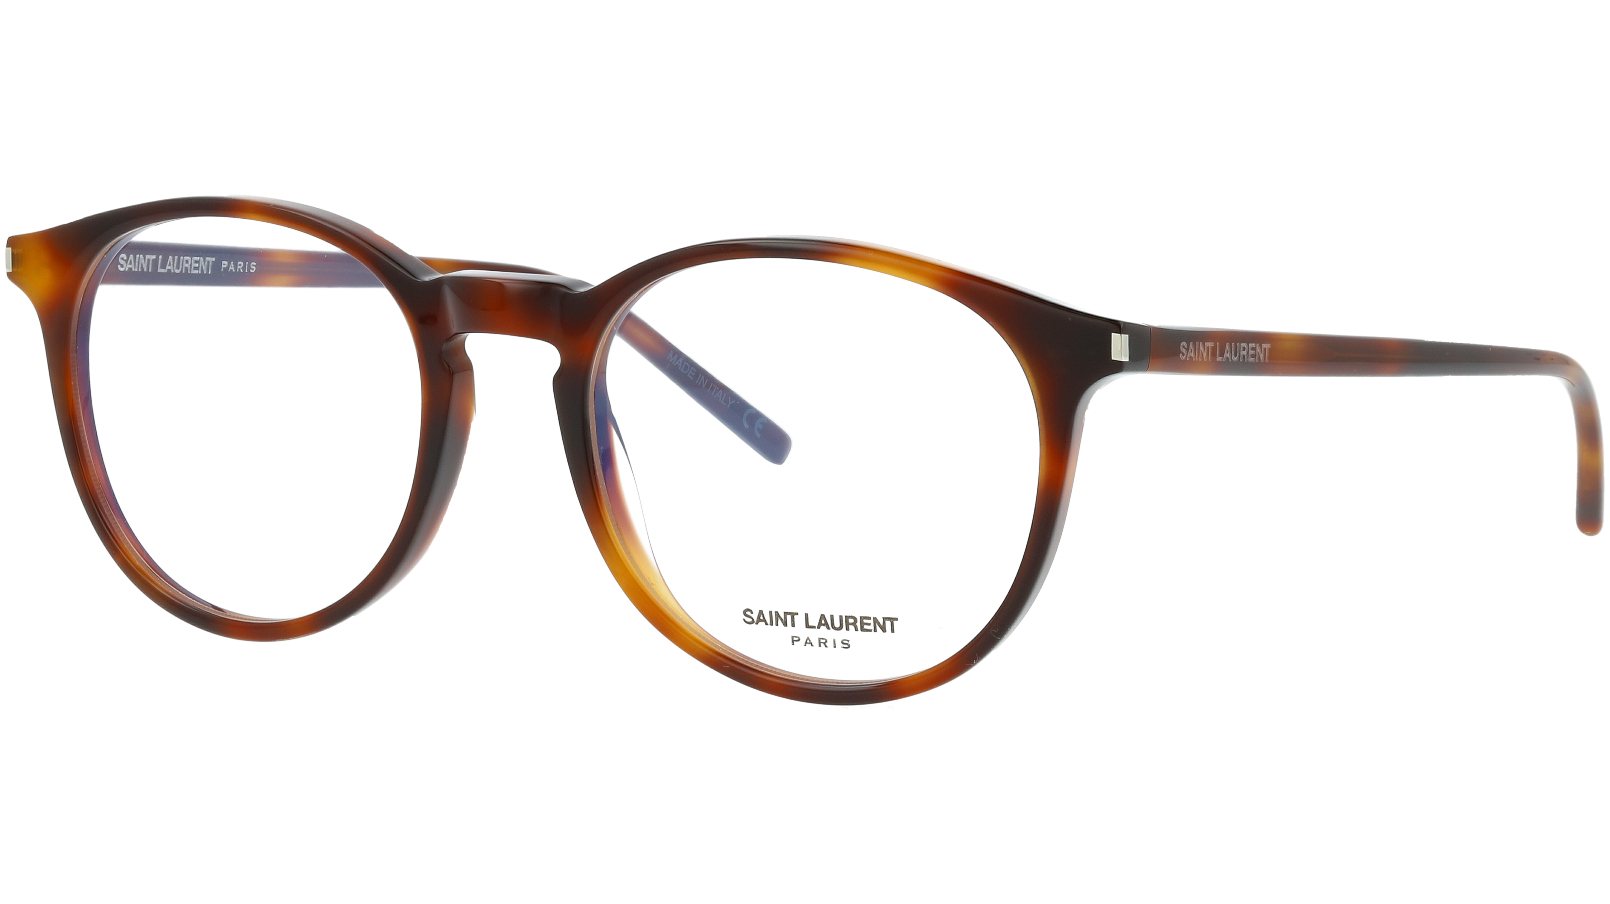 SAINT LAURENT SL106 002 50 AVANA Glasses